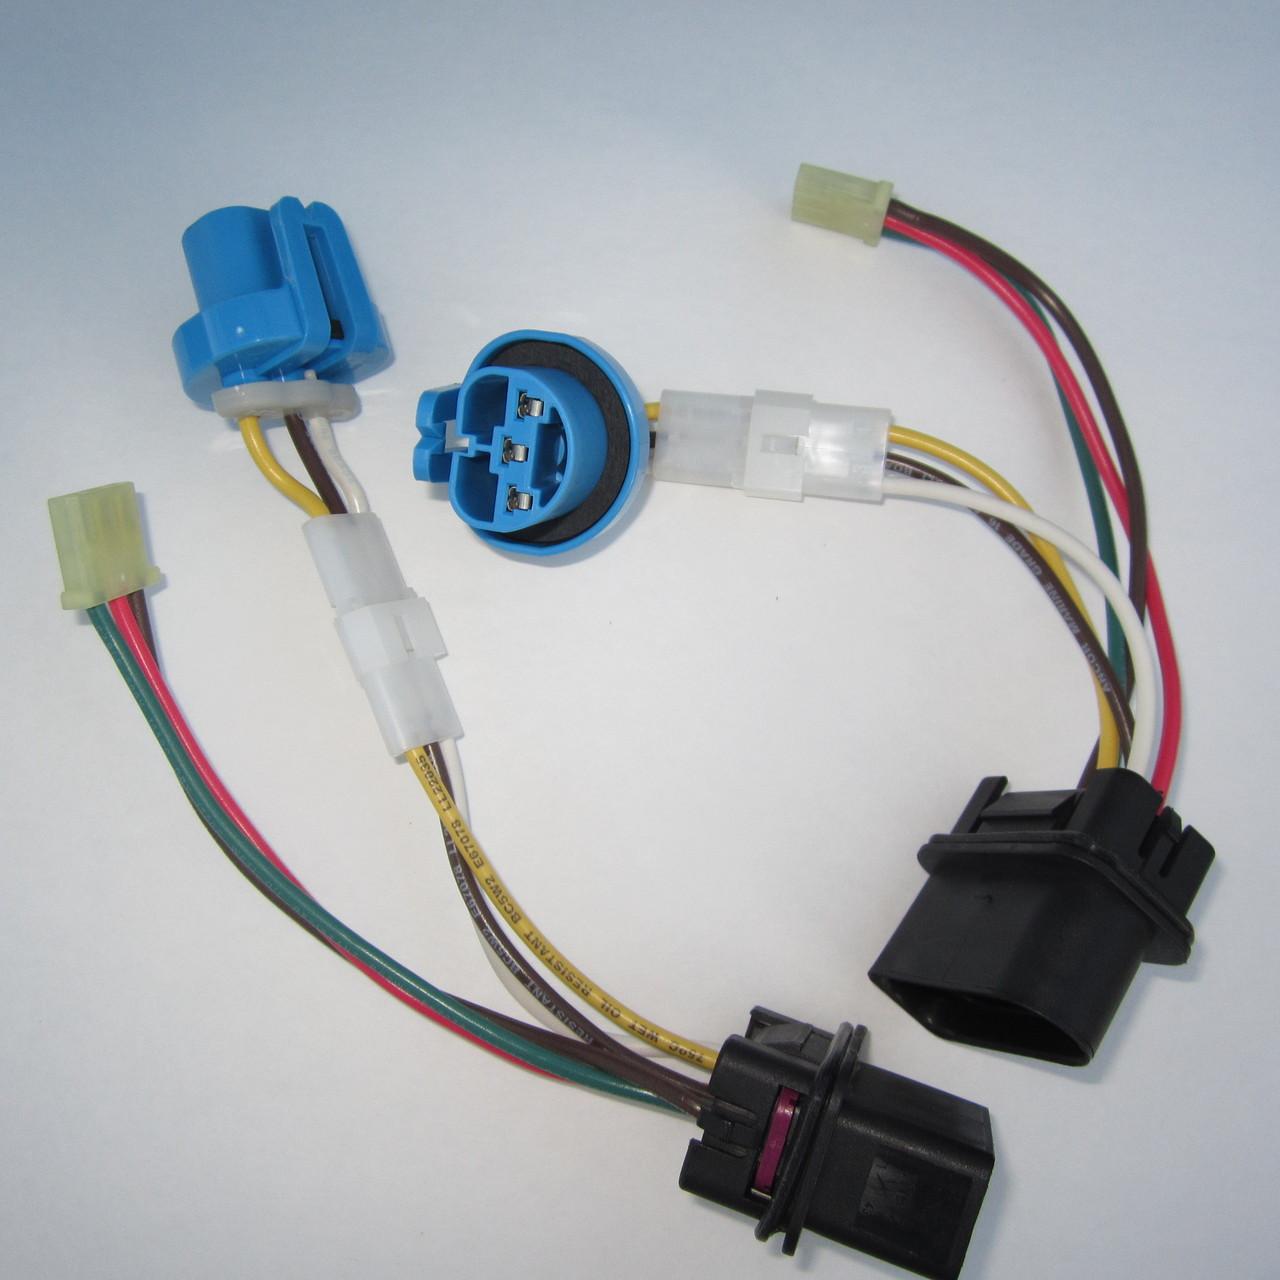 hight resolution of  2 brand new complete jetta headlight wiring harness 1999 2005 vw mk4